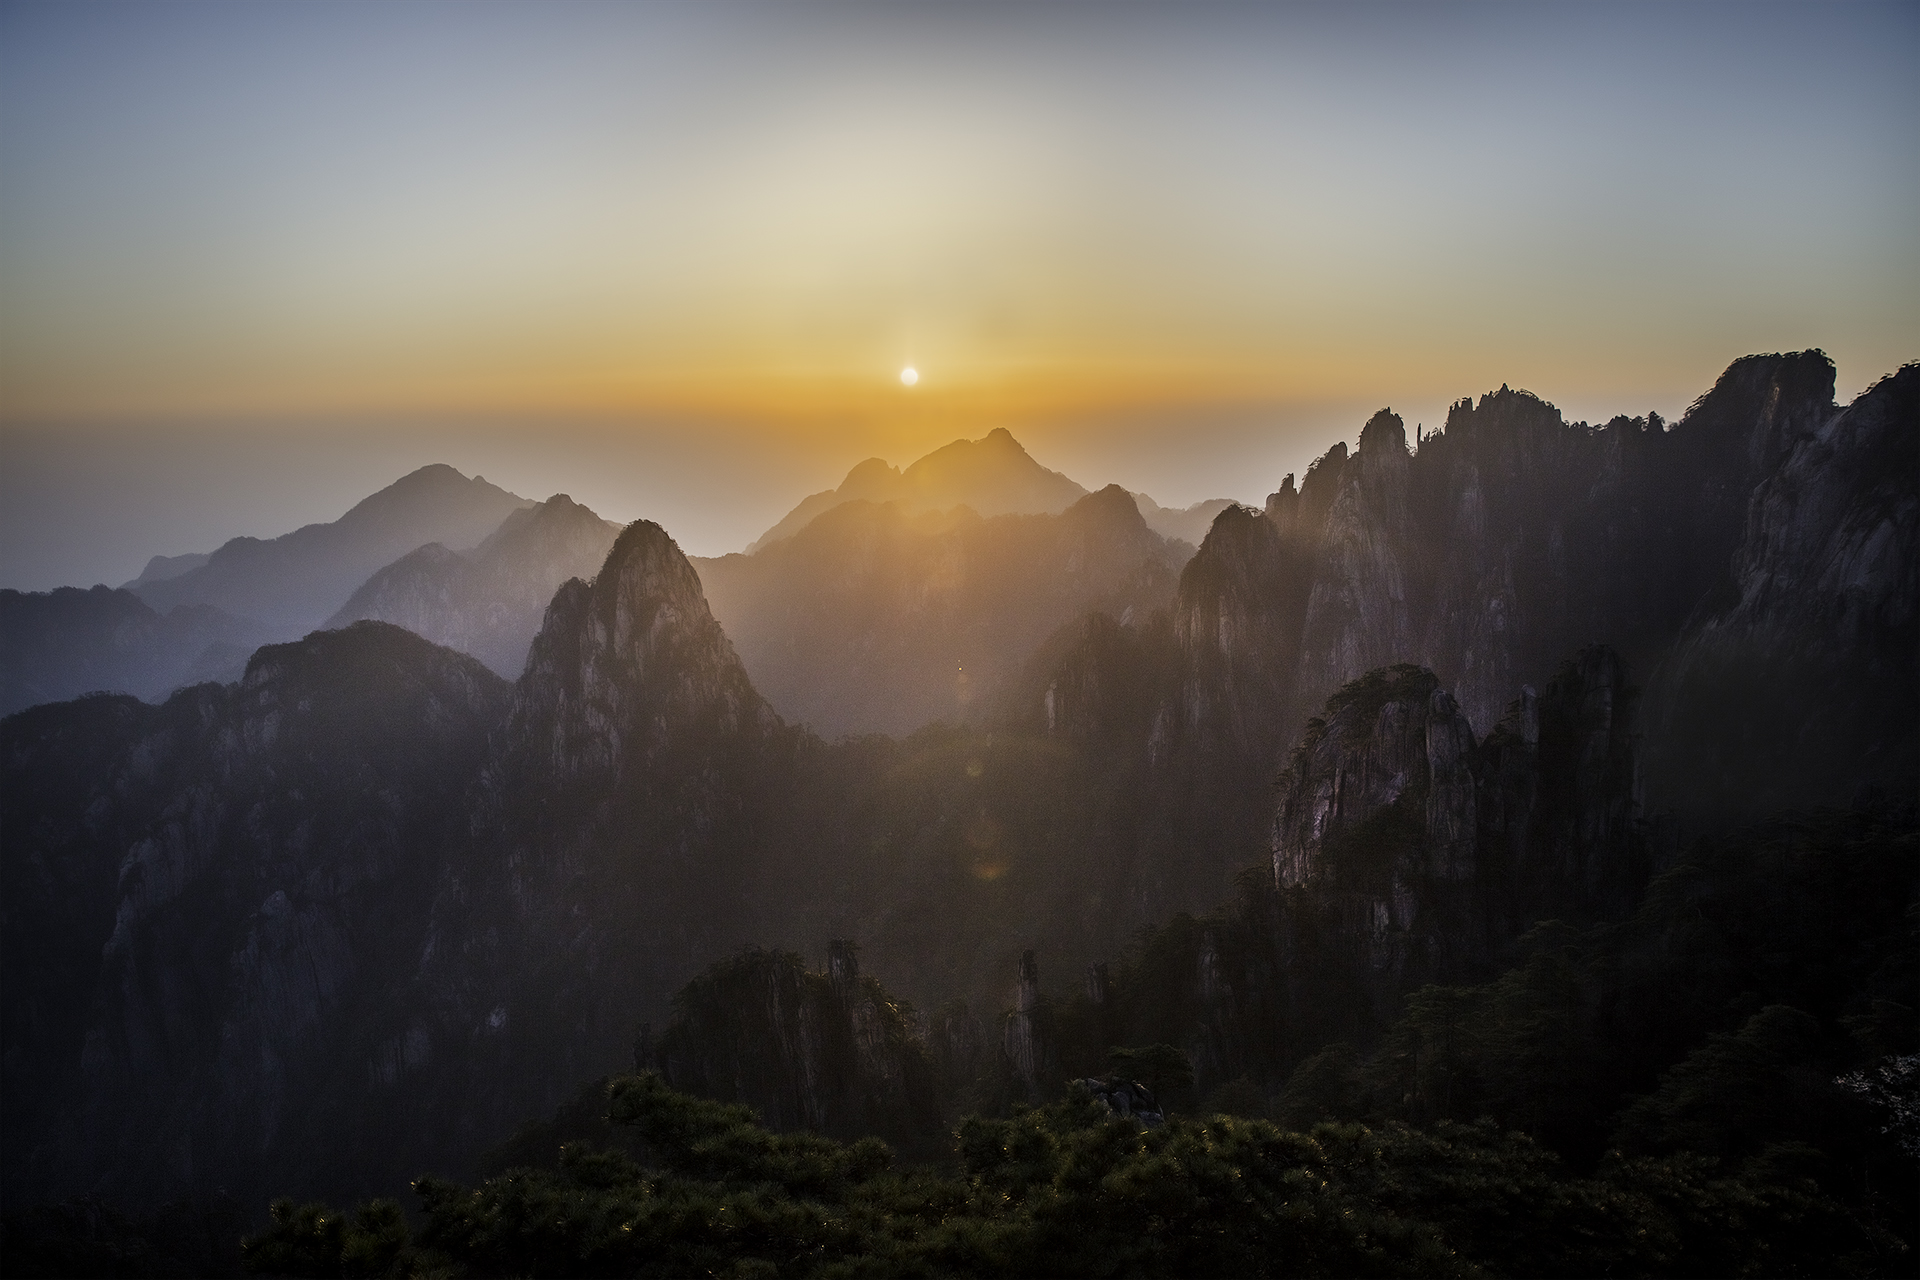 Huangshan National Park, Anhui